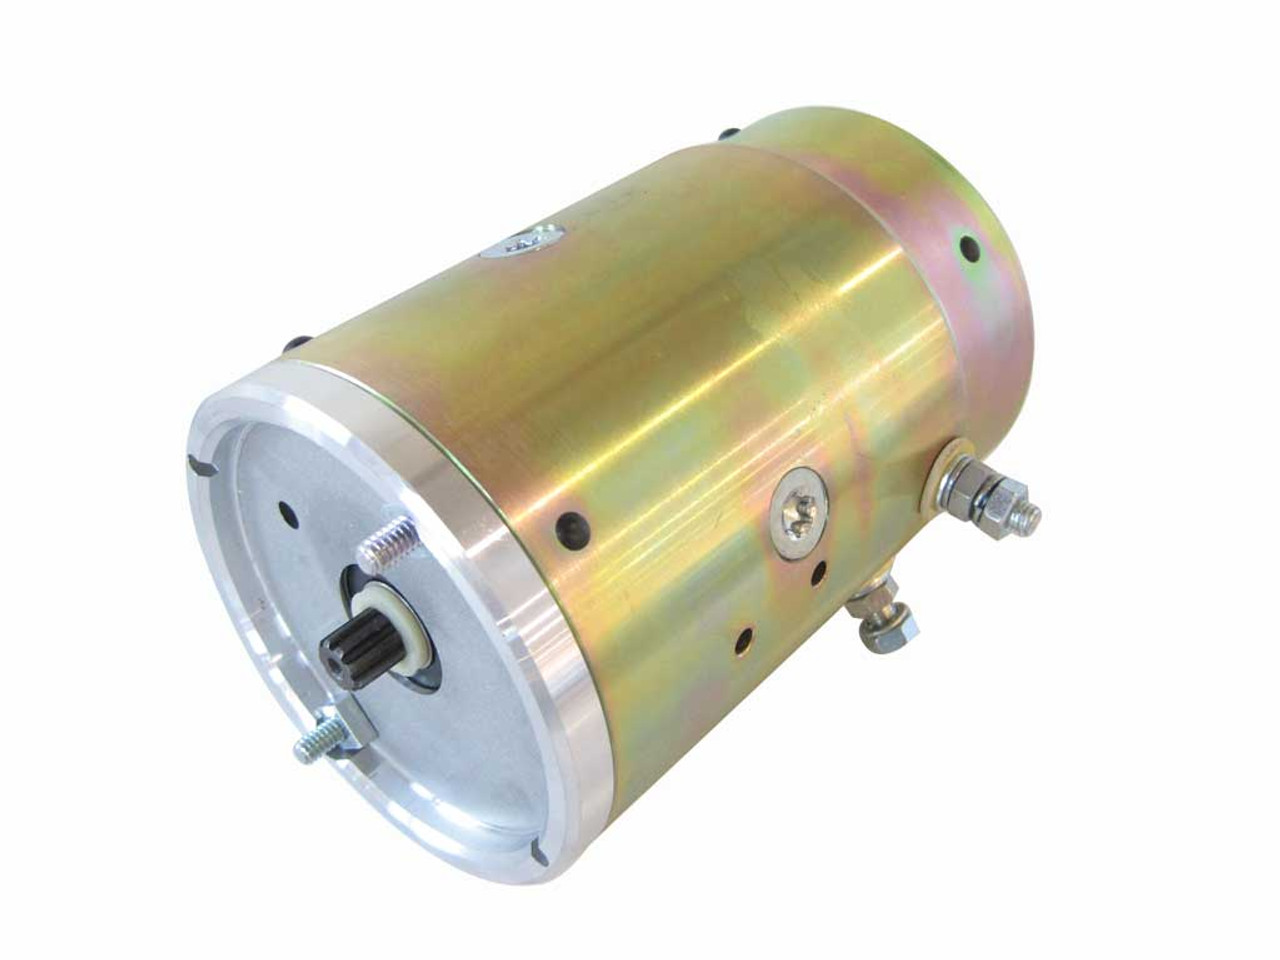 12 Volt Motor >> 12 Volt Dc Electric Motor 1245 18